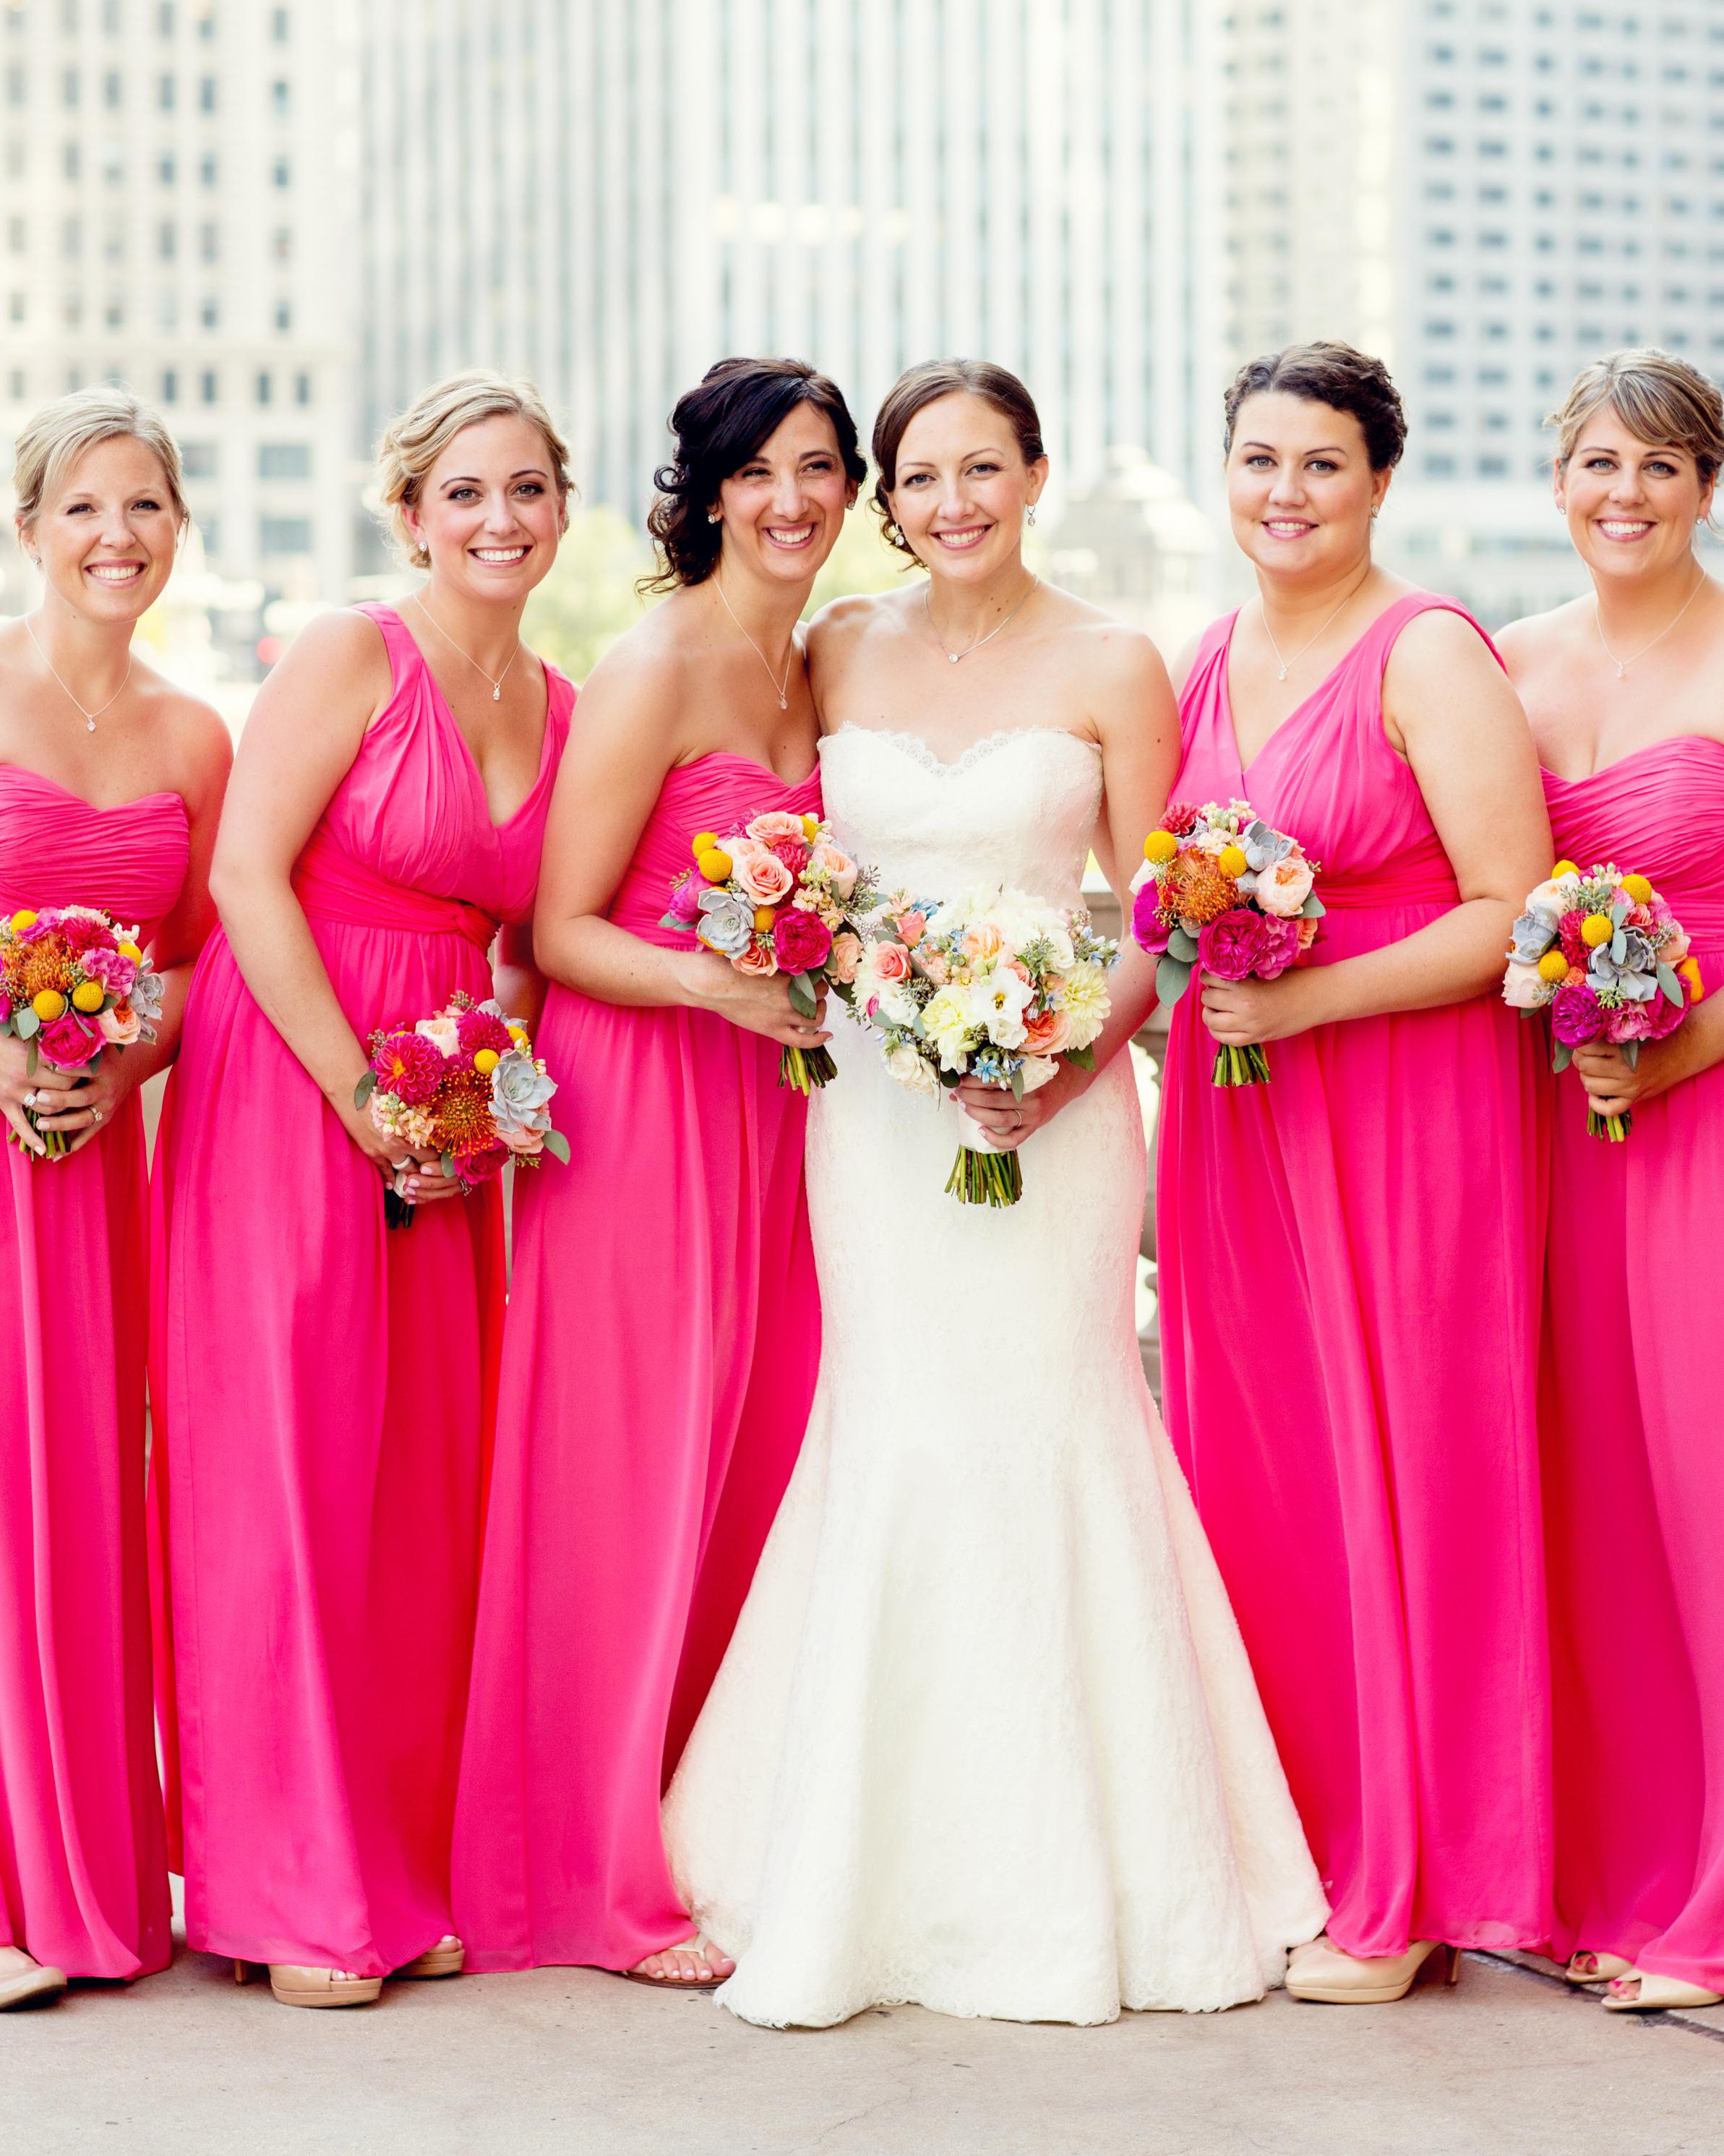 christina-jimmy-wedding-bridesmaids-8033.jpg